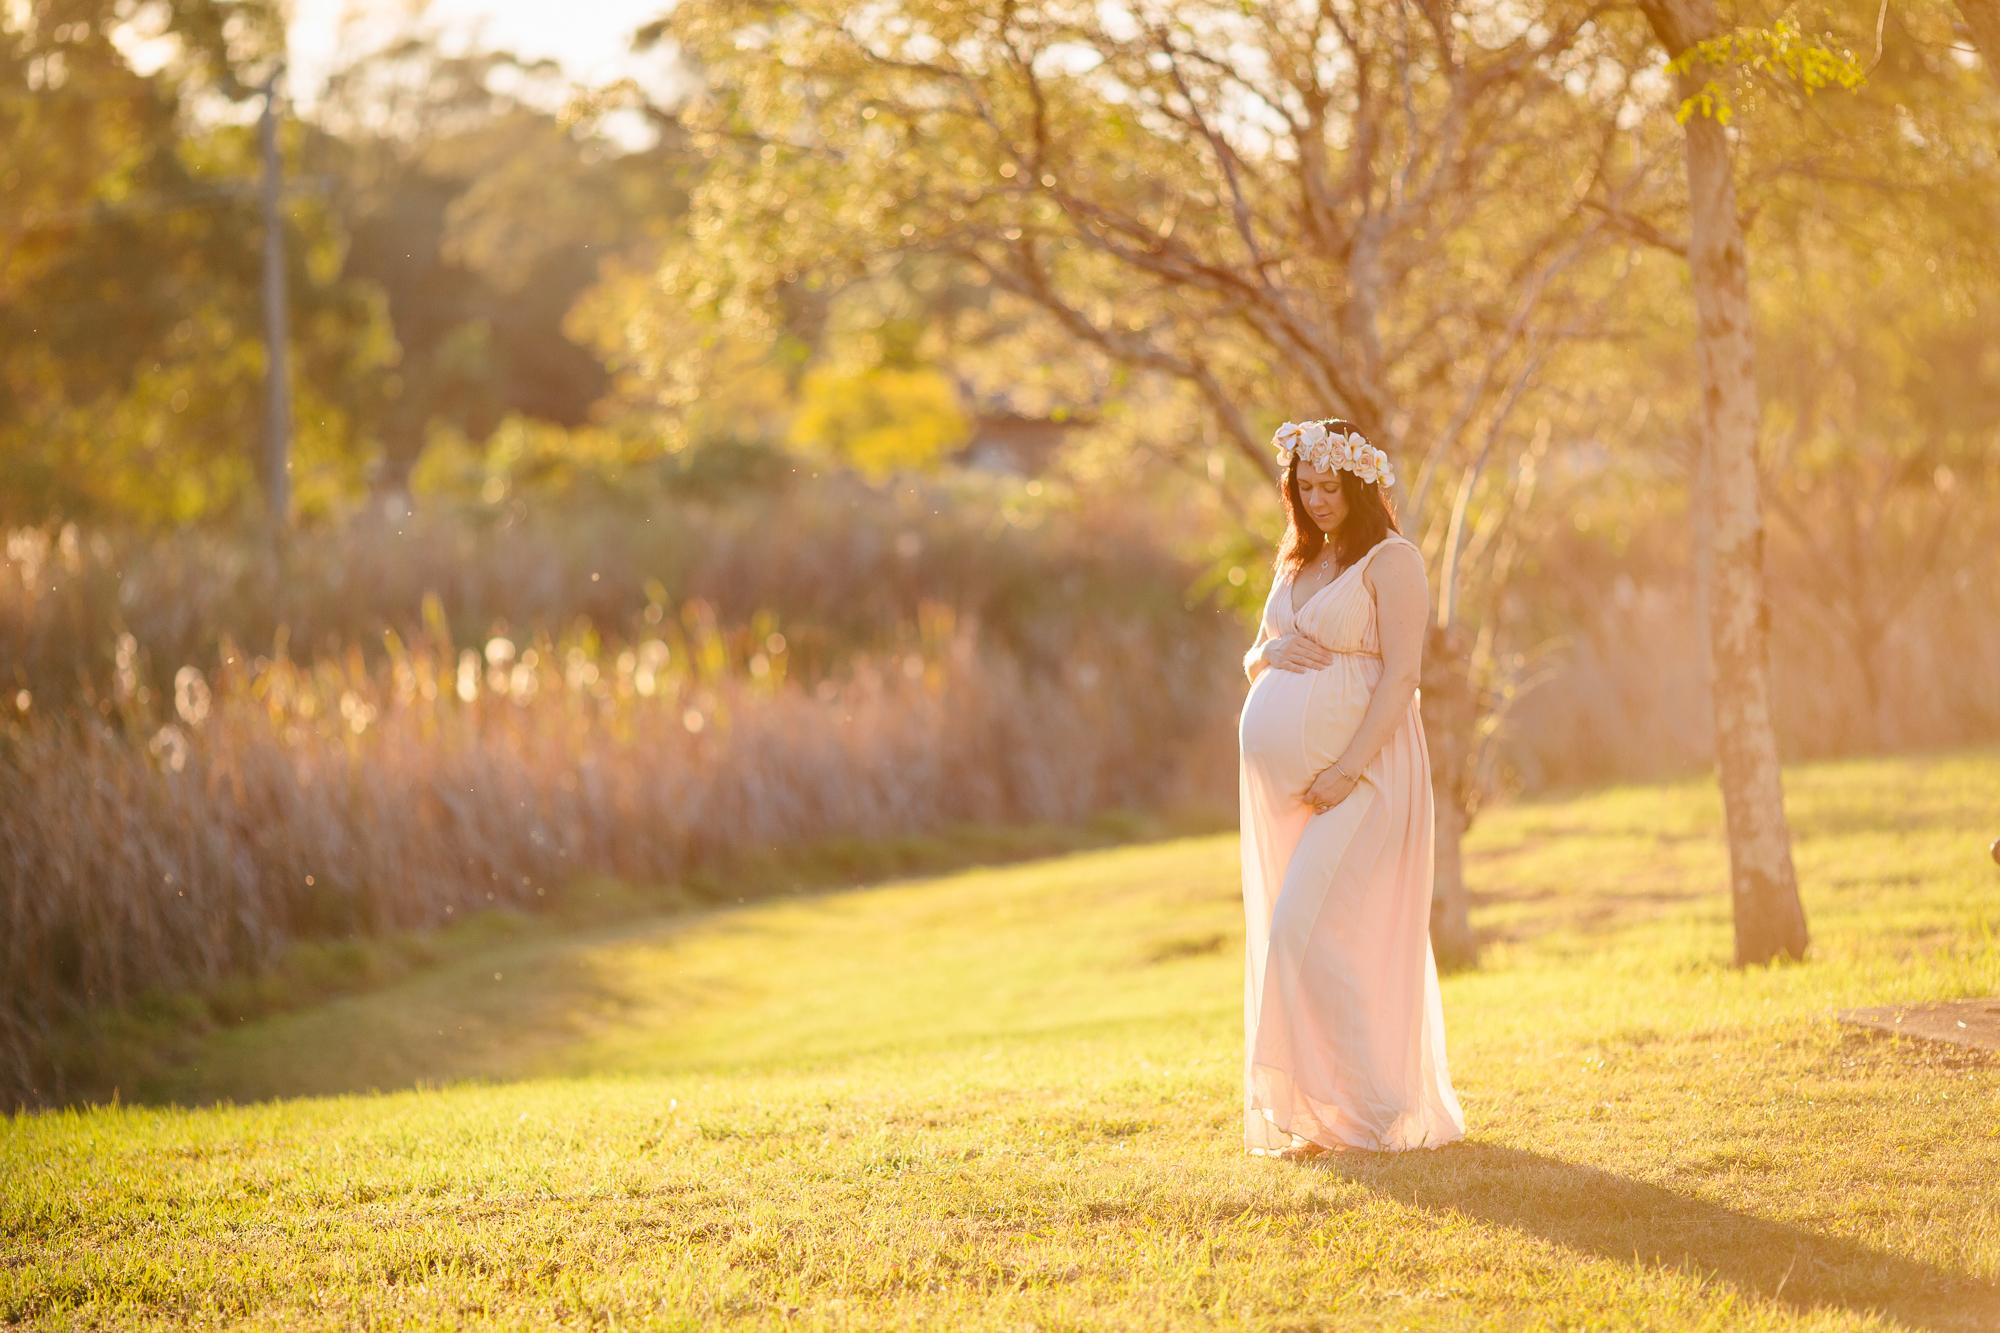 034_Maternity Lifetsyle_Shelley_Sunlight Photography.JPG